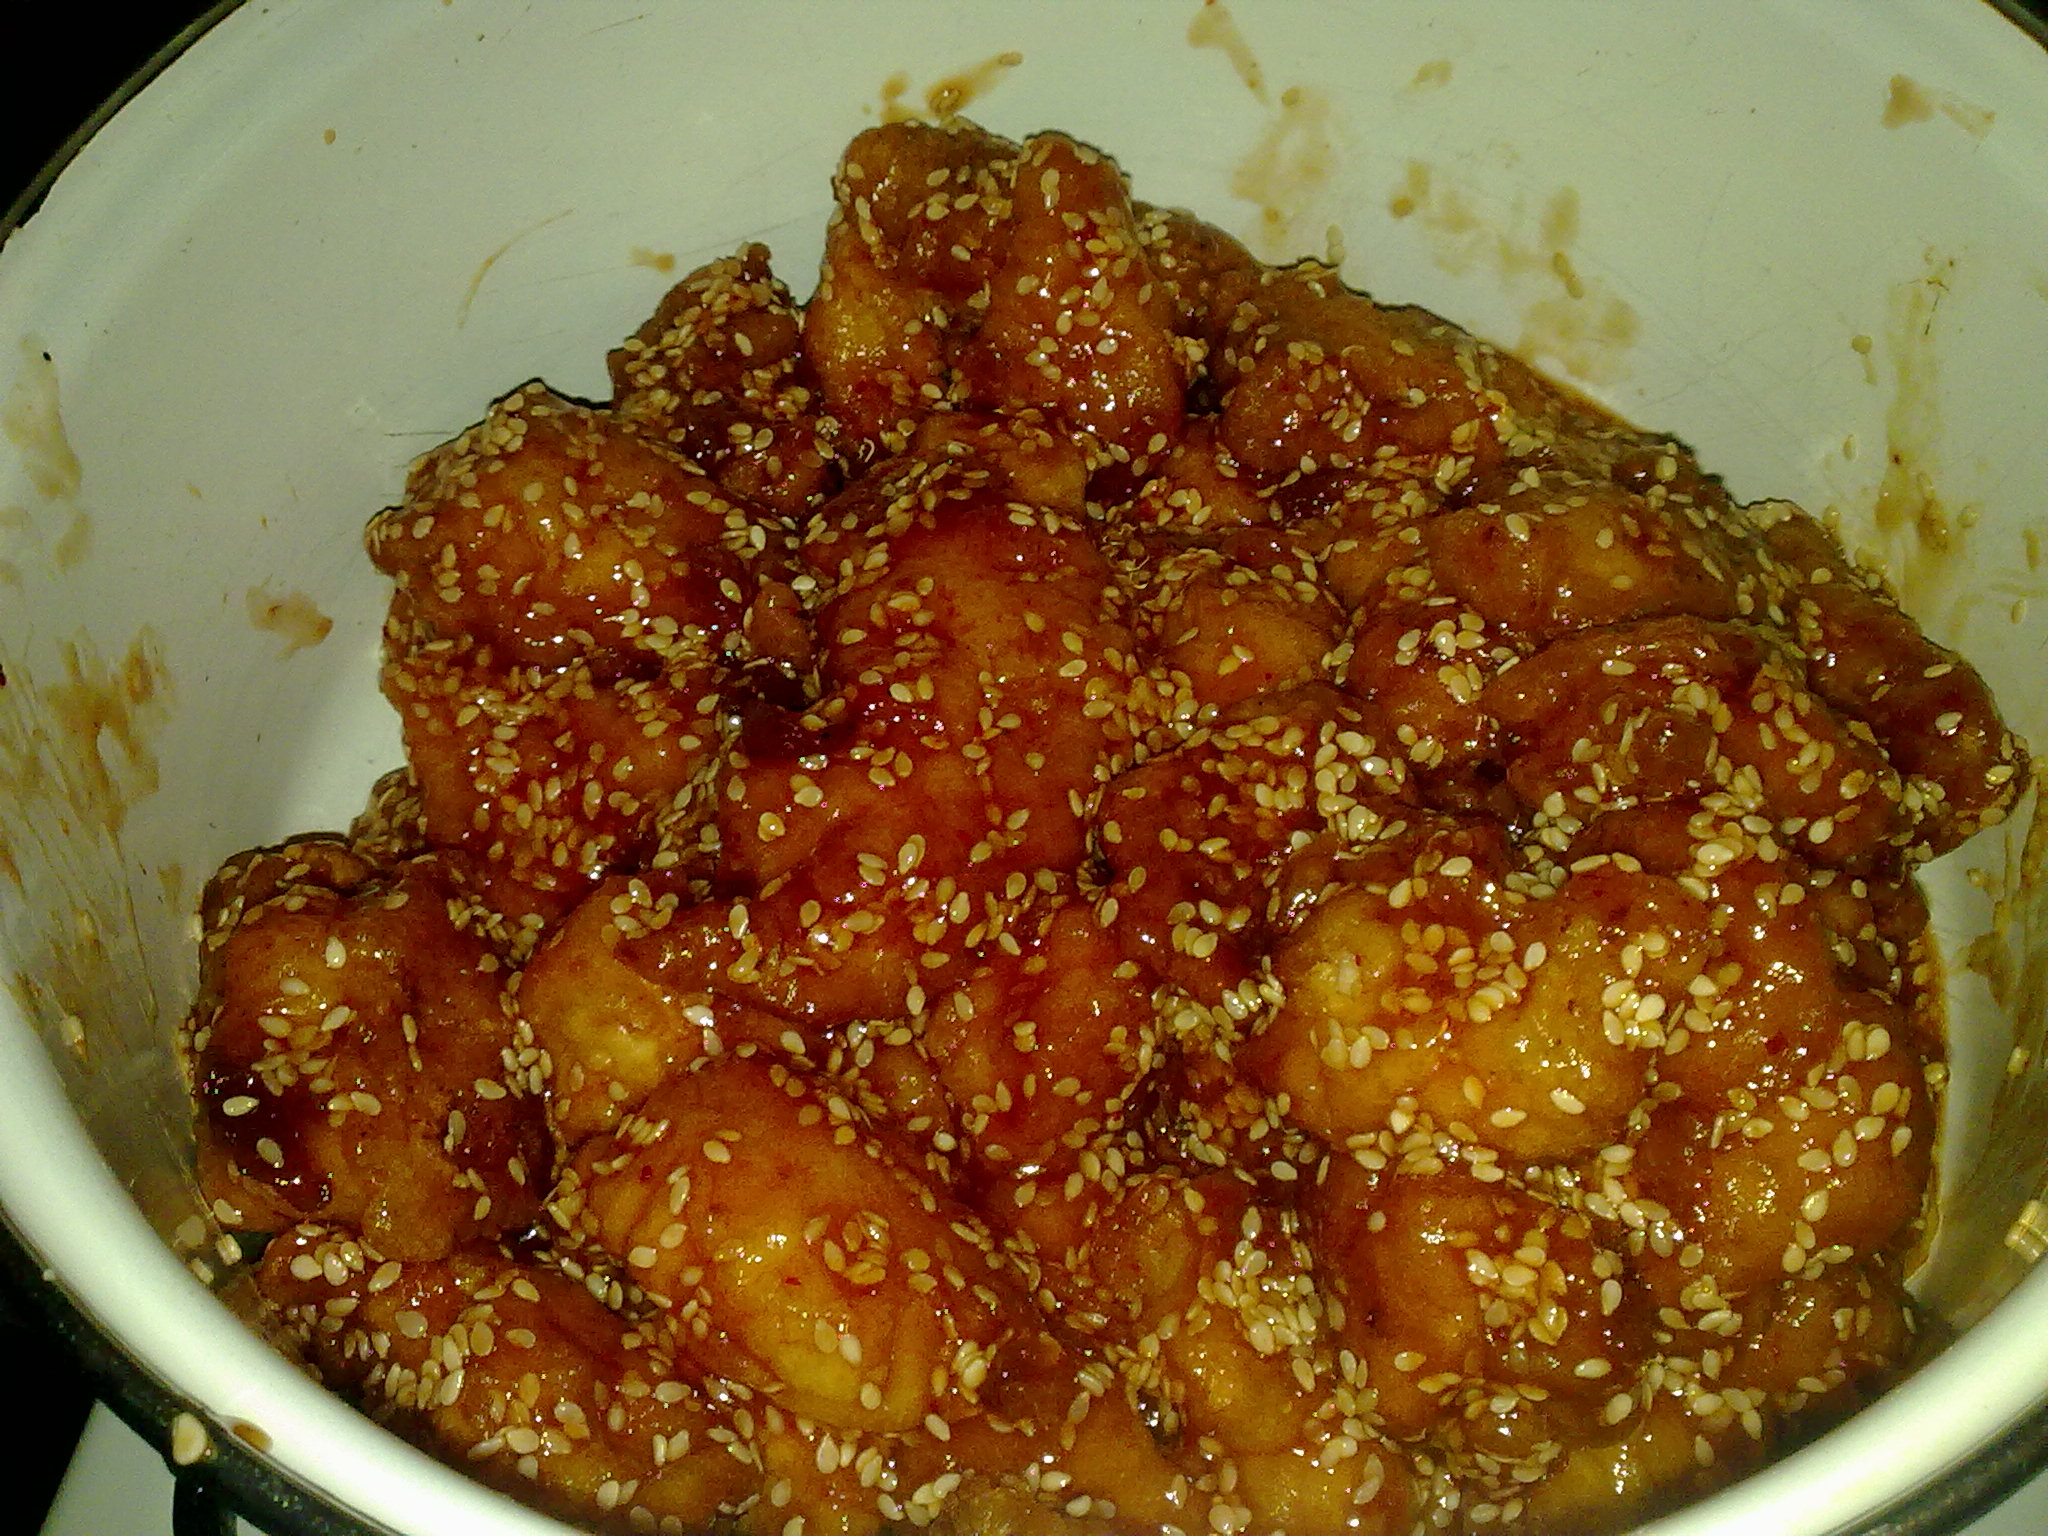 https://foodloader.net/glKz_2010-08-23_chinese_chickenwithsesame.jpg